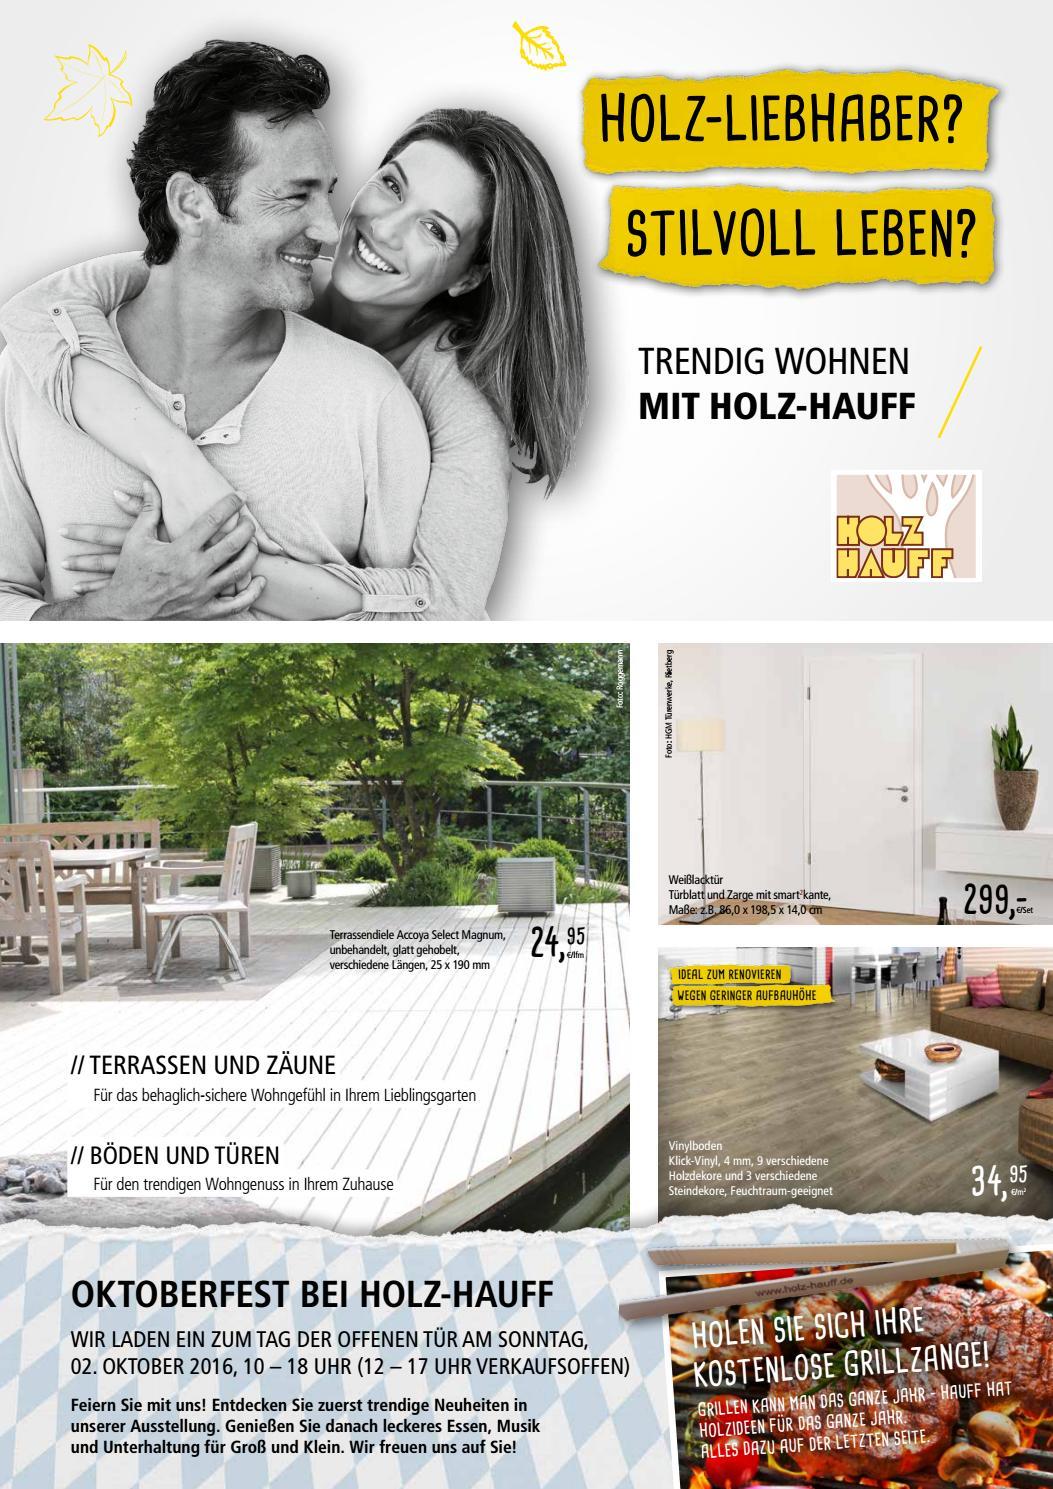 Holz Hauff Herbstbeilage 2016 By Opus Marketing GmbH   Issuu